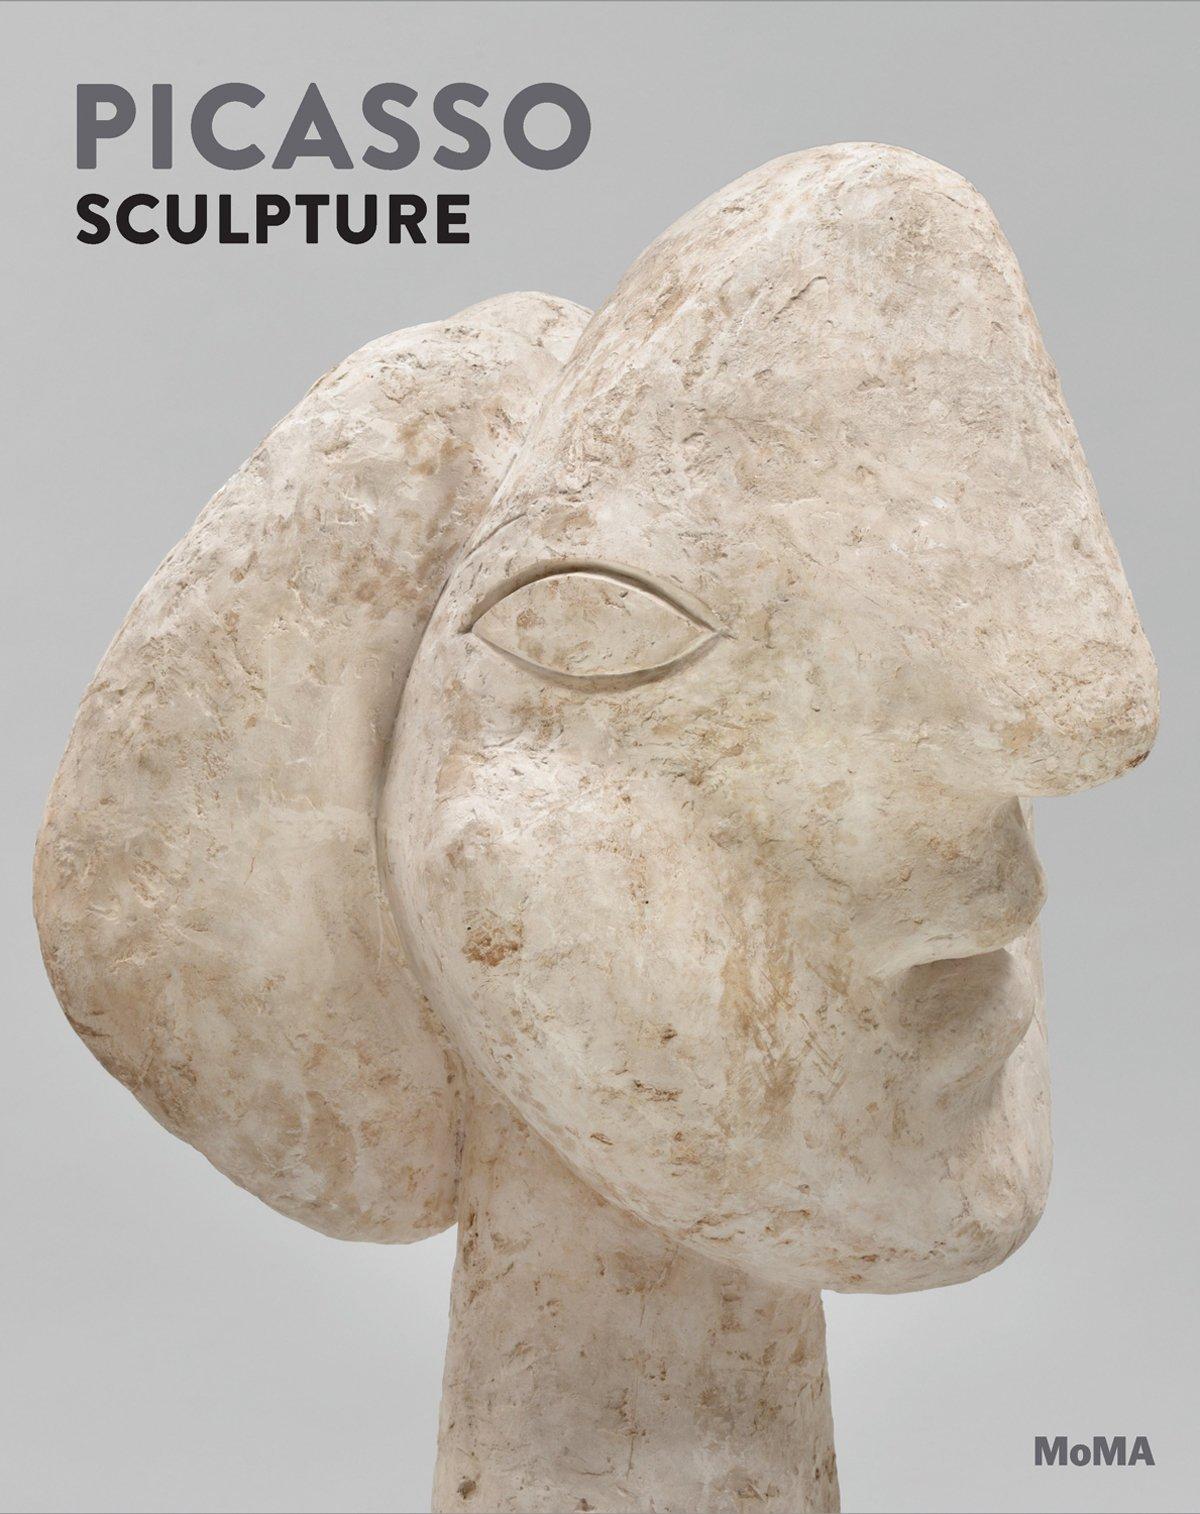 Picasso Sculpture ISBN-13 9780870709746